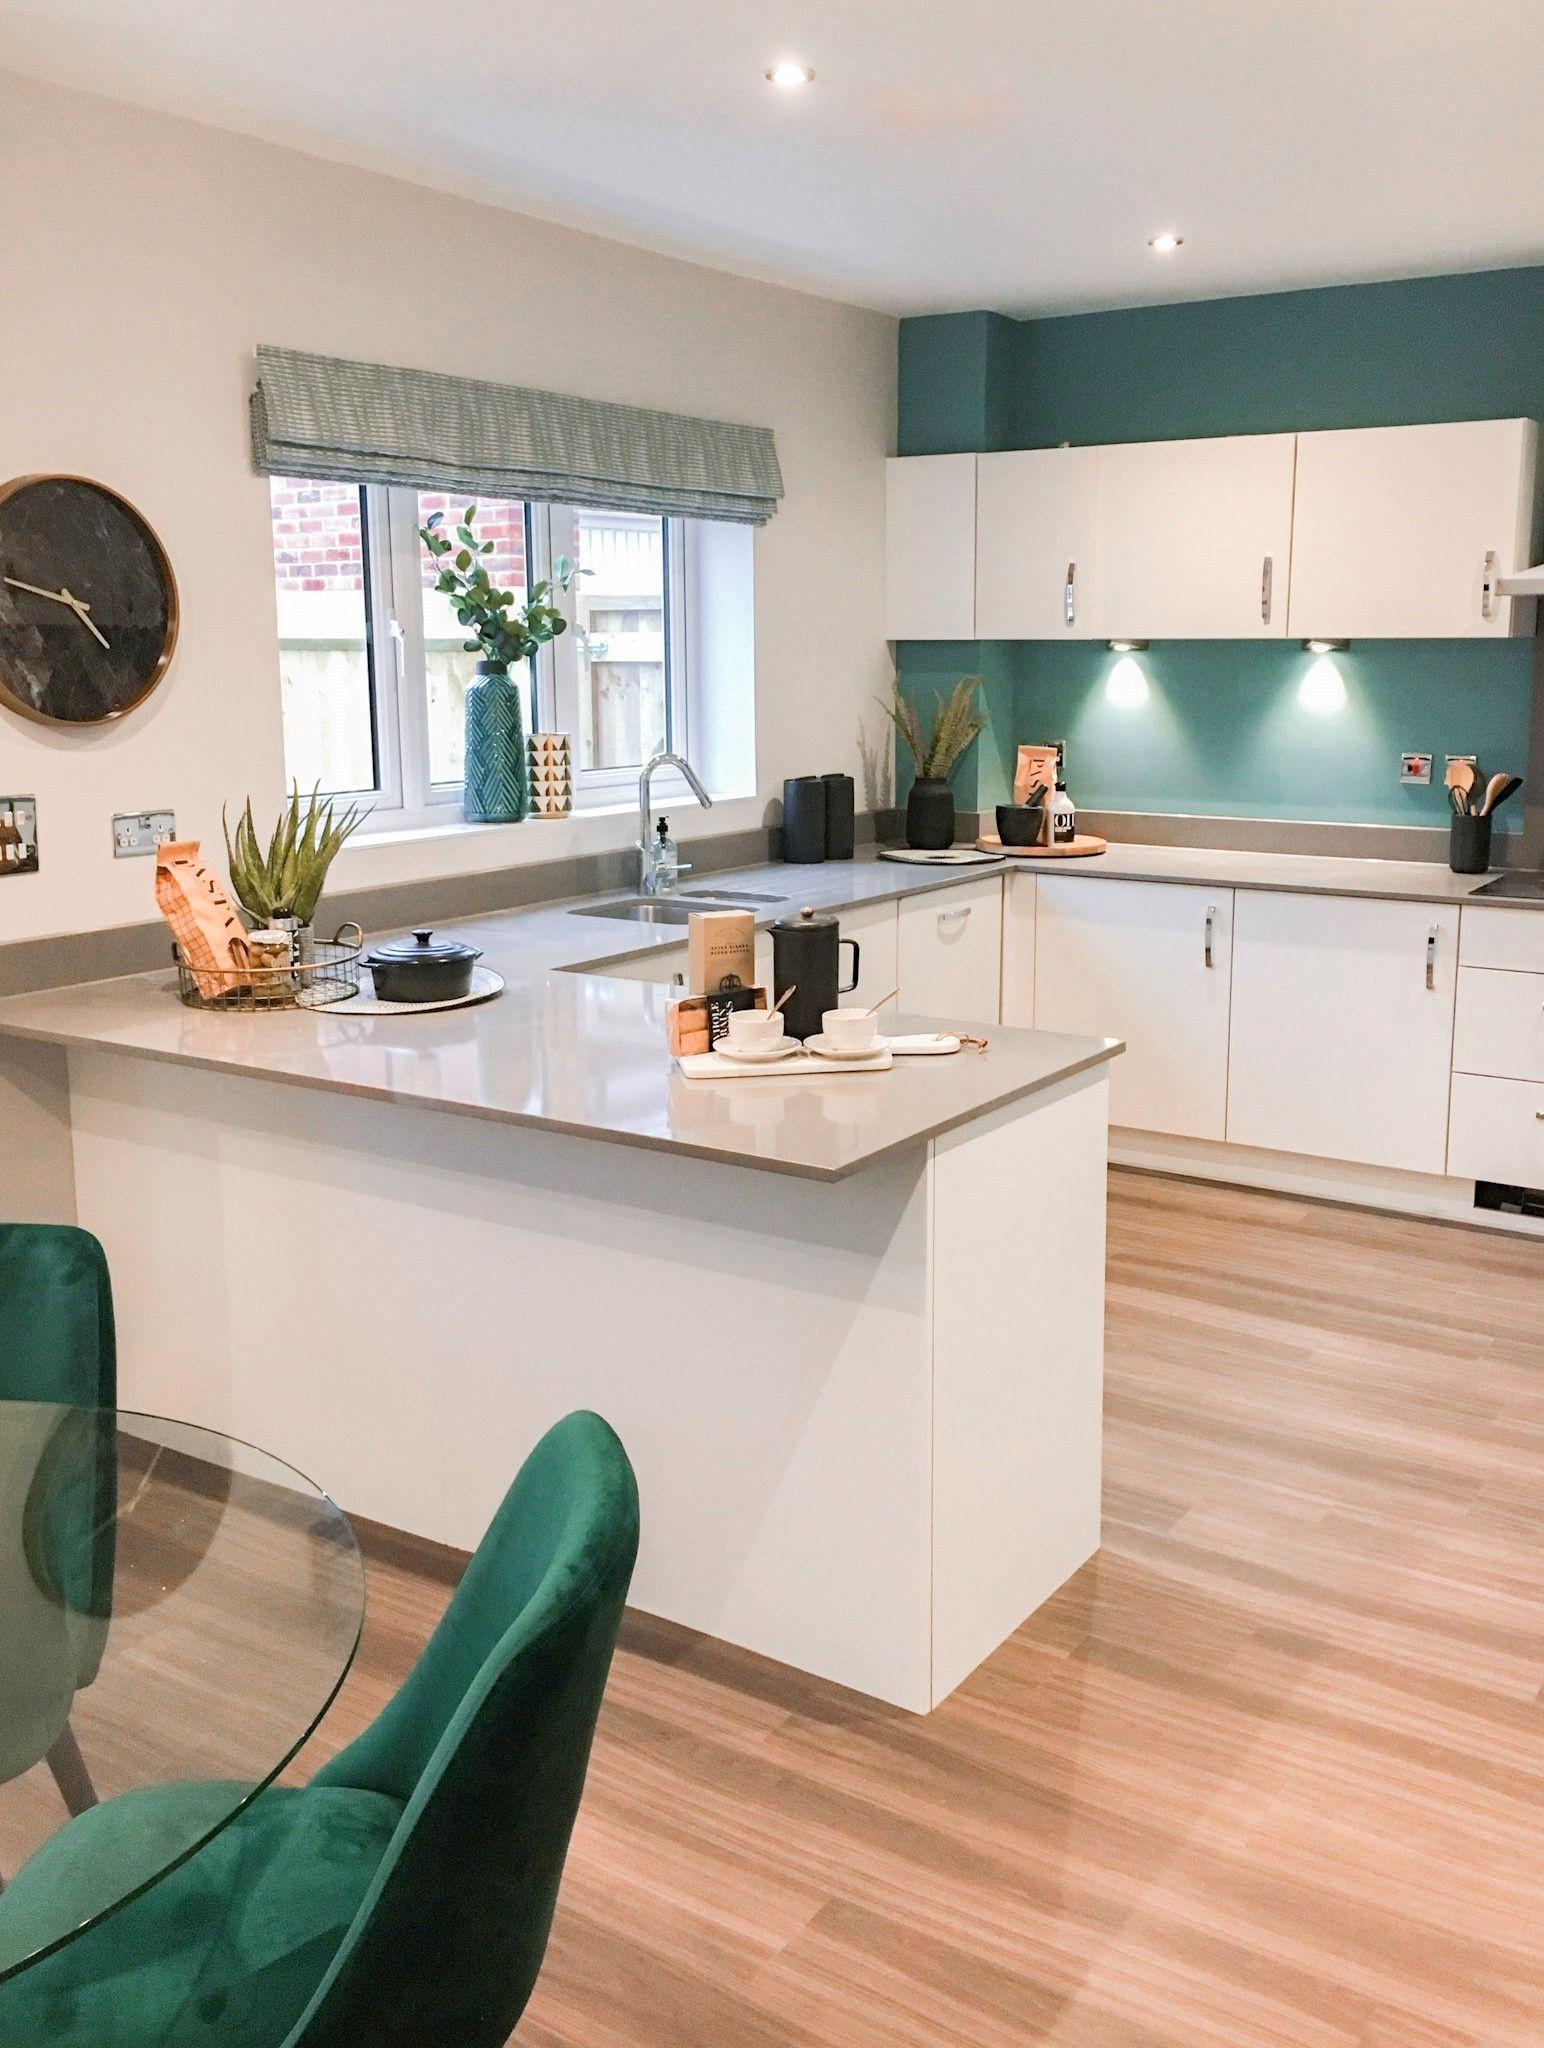 Contemporary new build kitchen